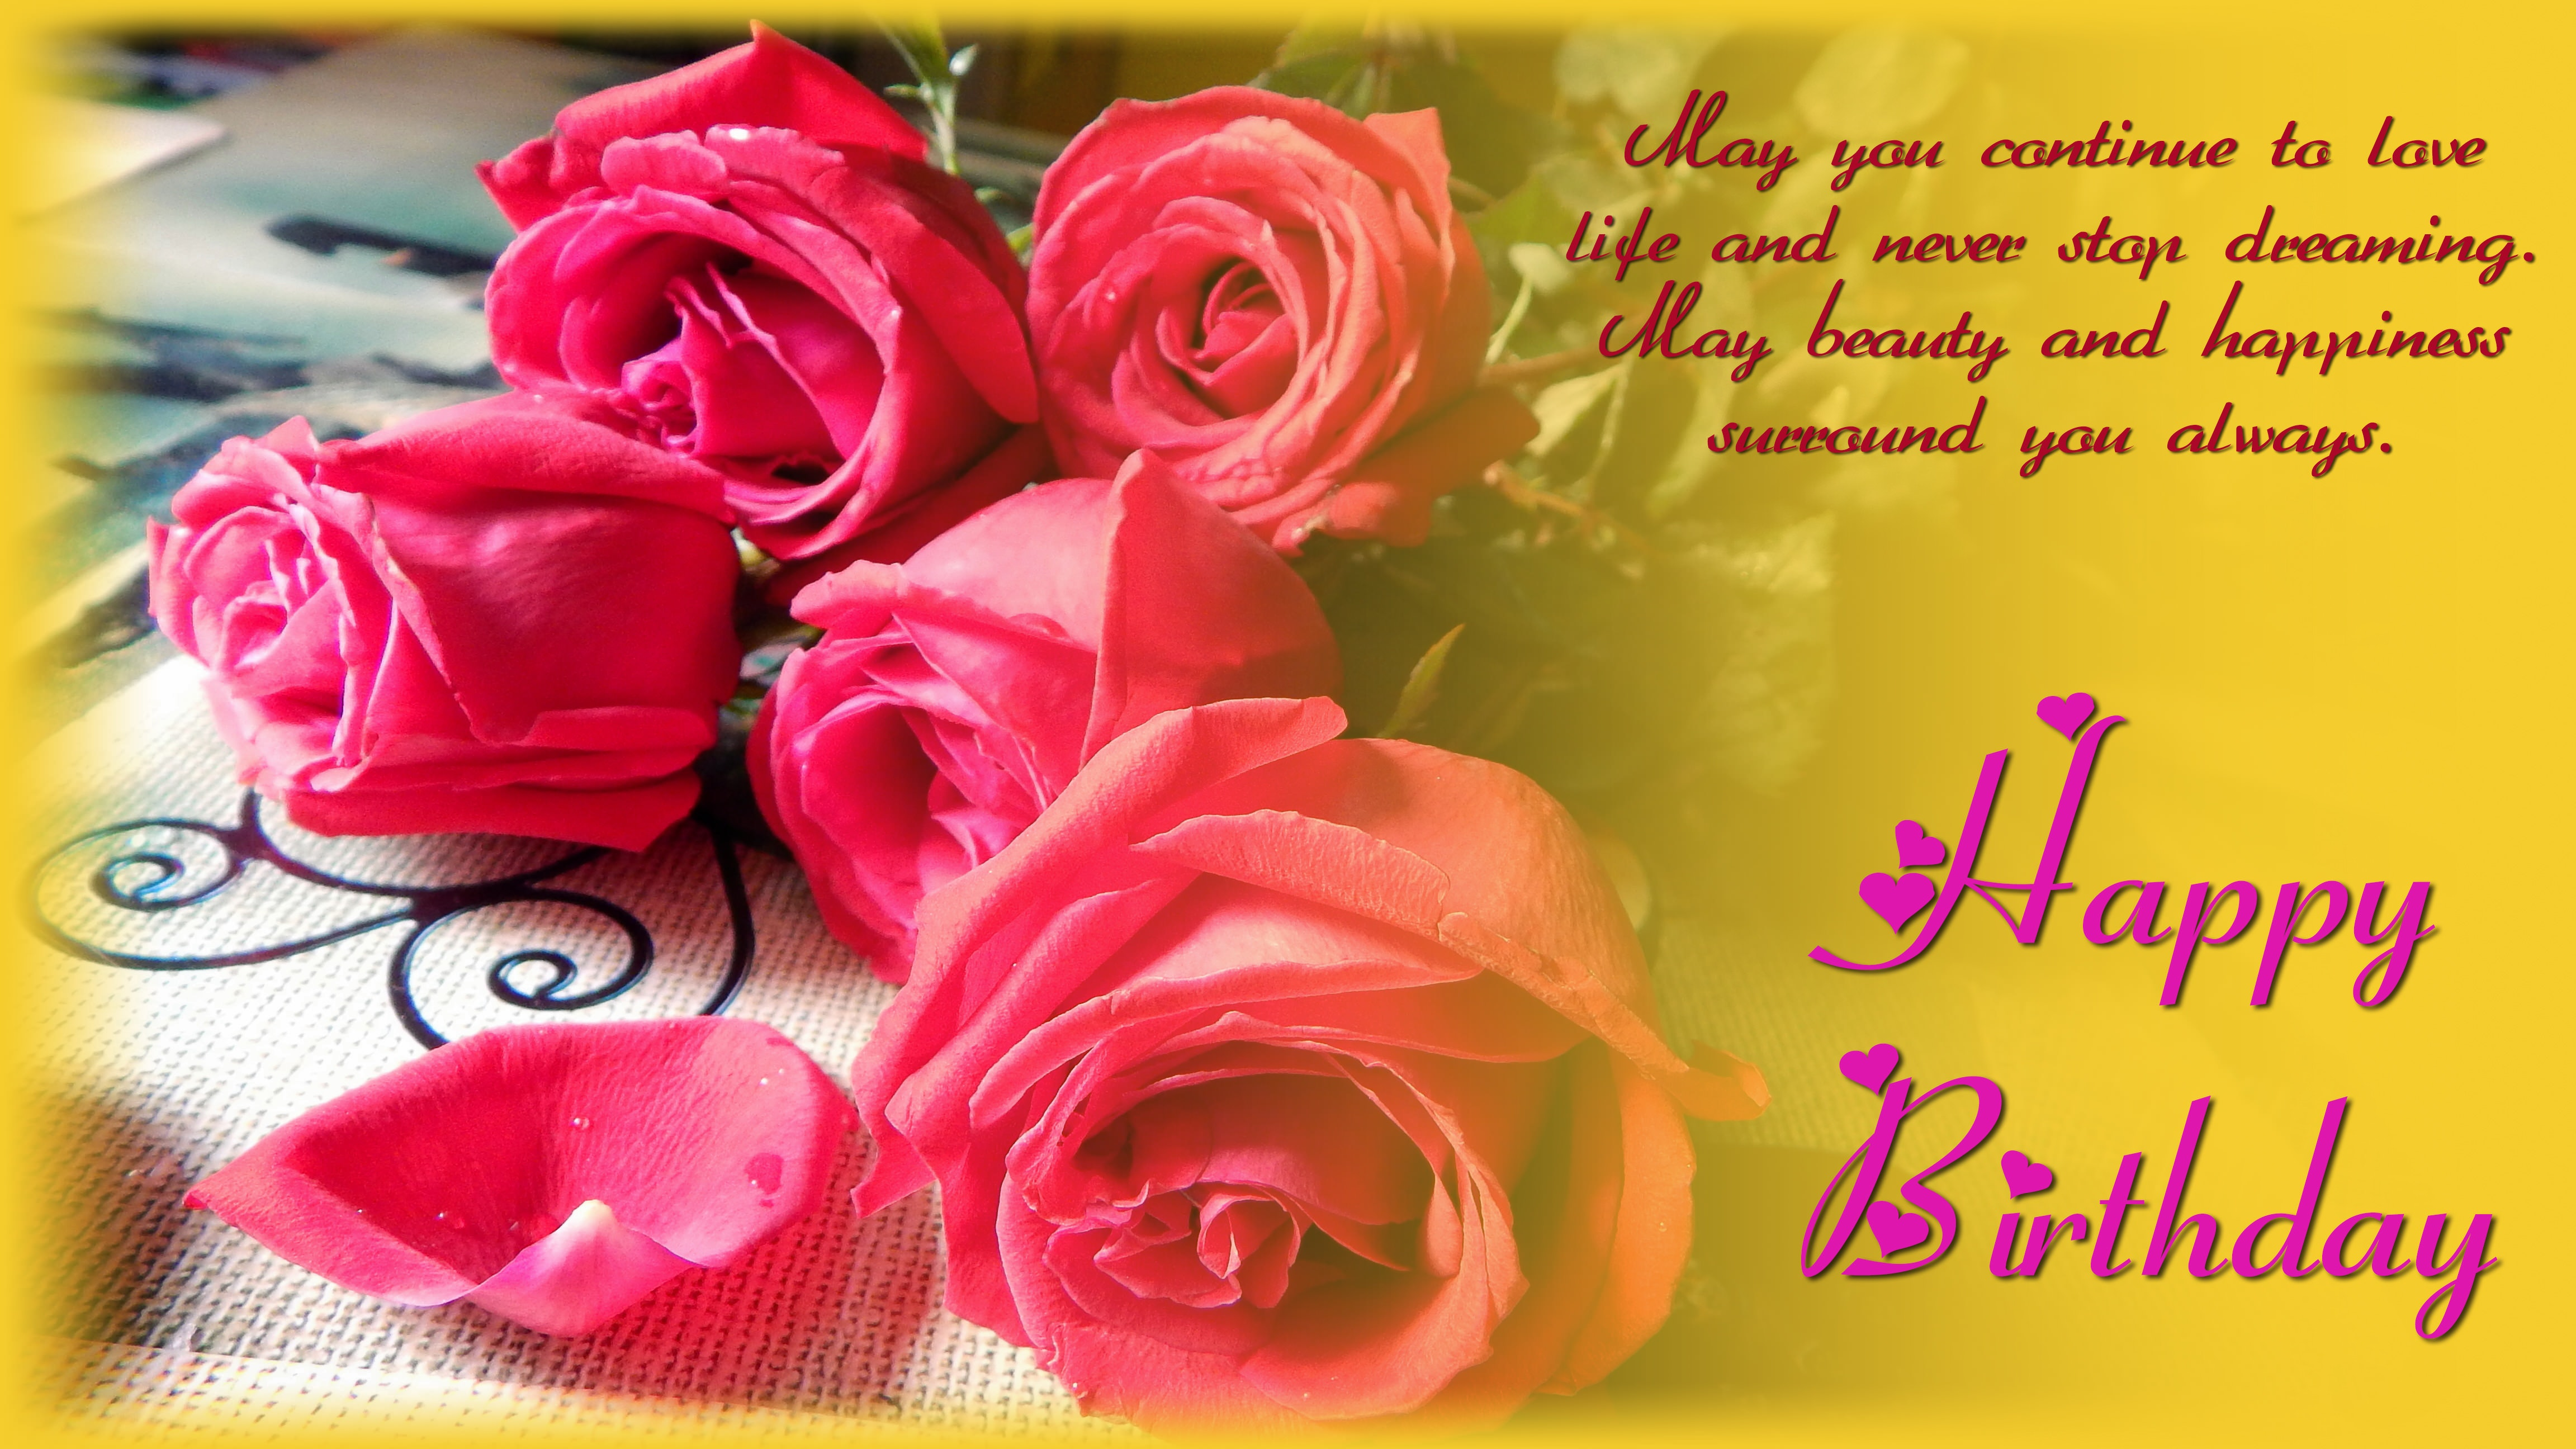 Free stock photo of beautiful flowers birthday happy birthday free download izmirmasajfo